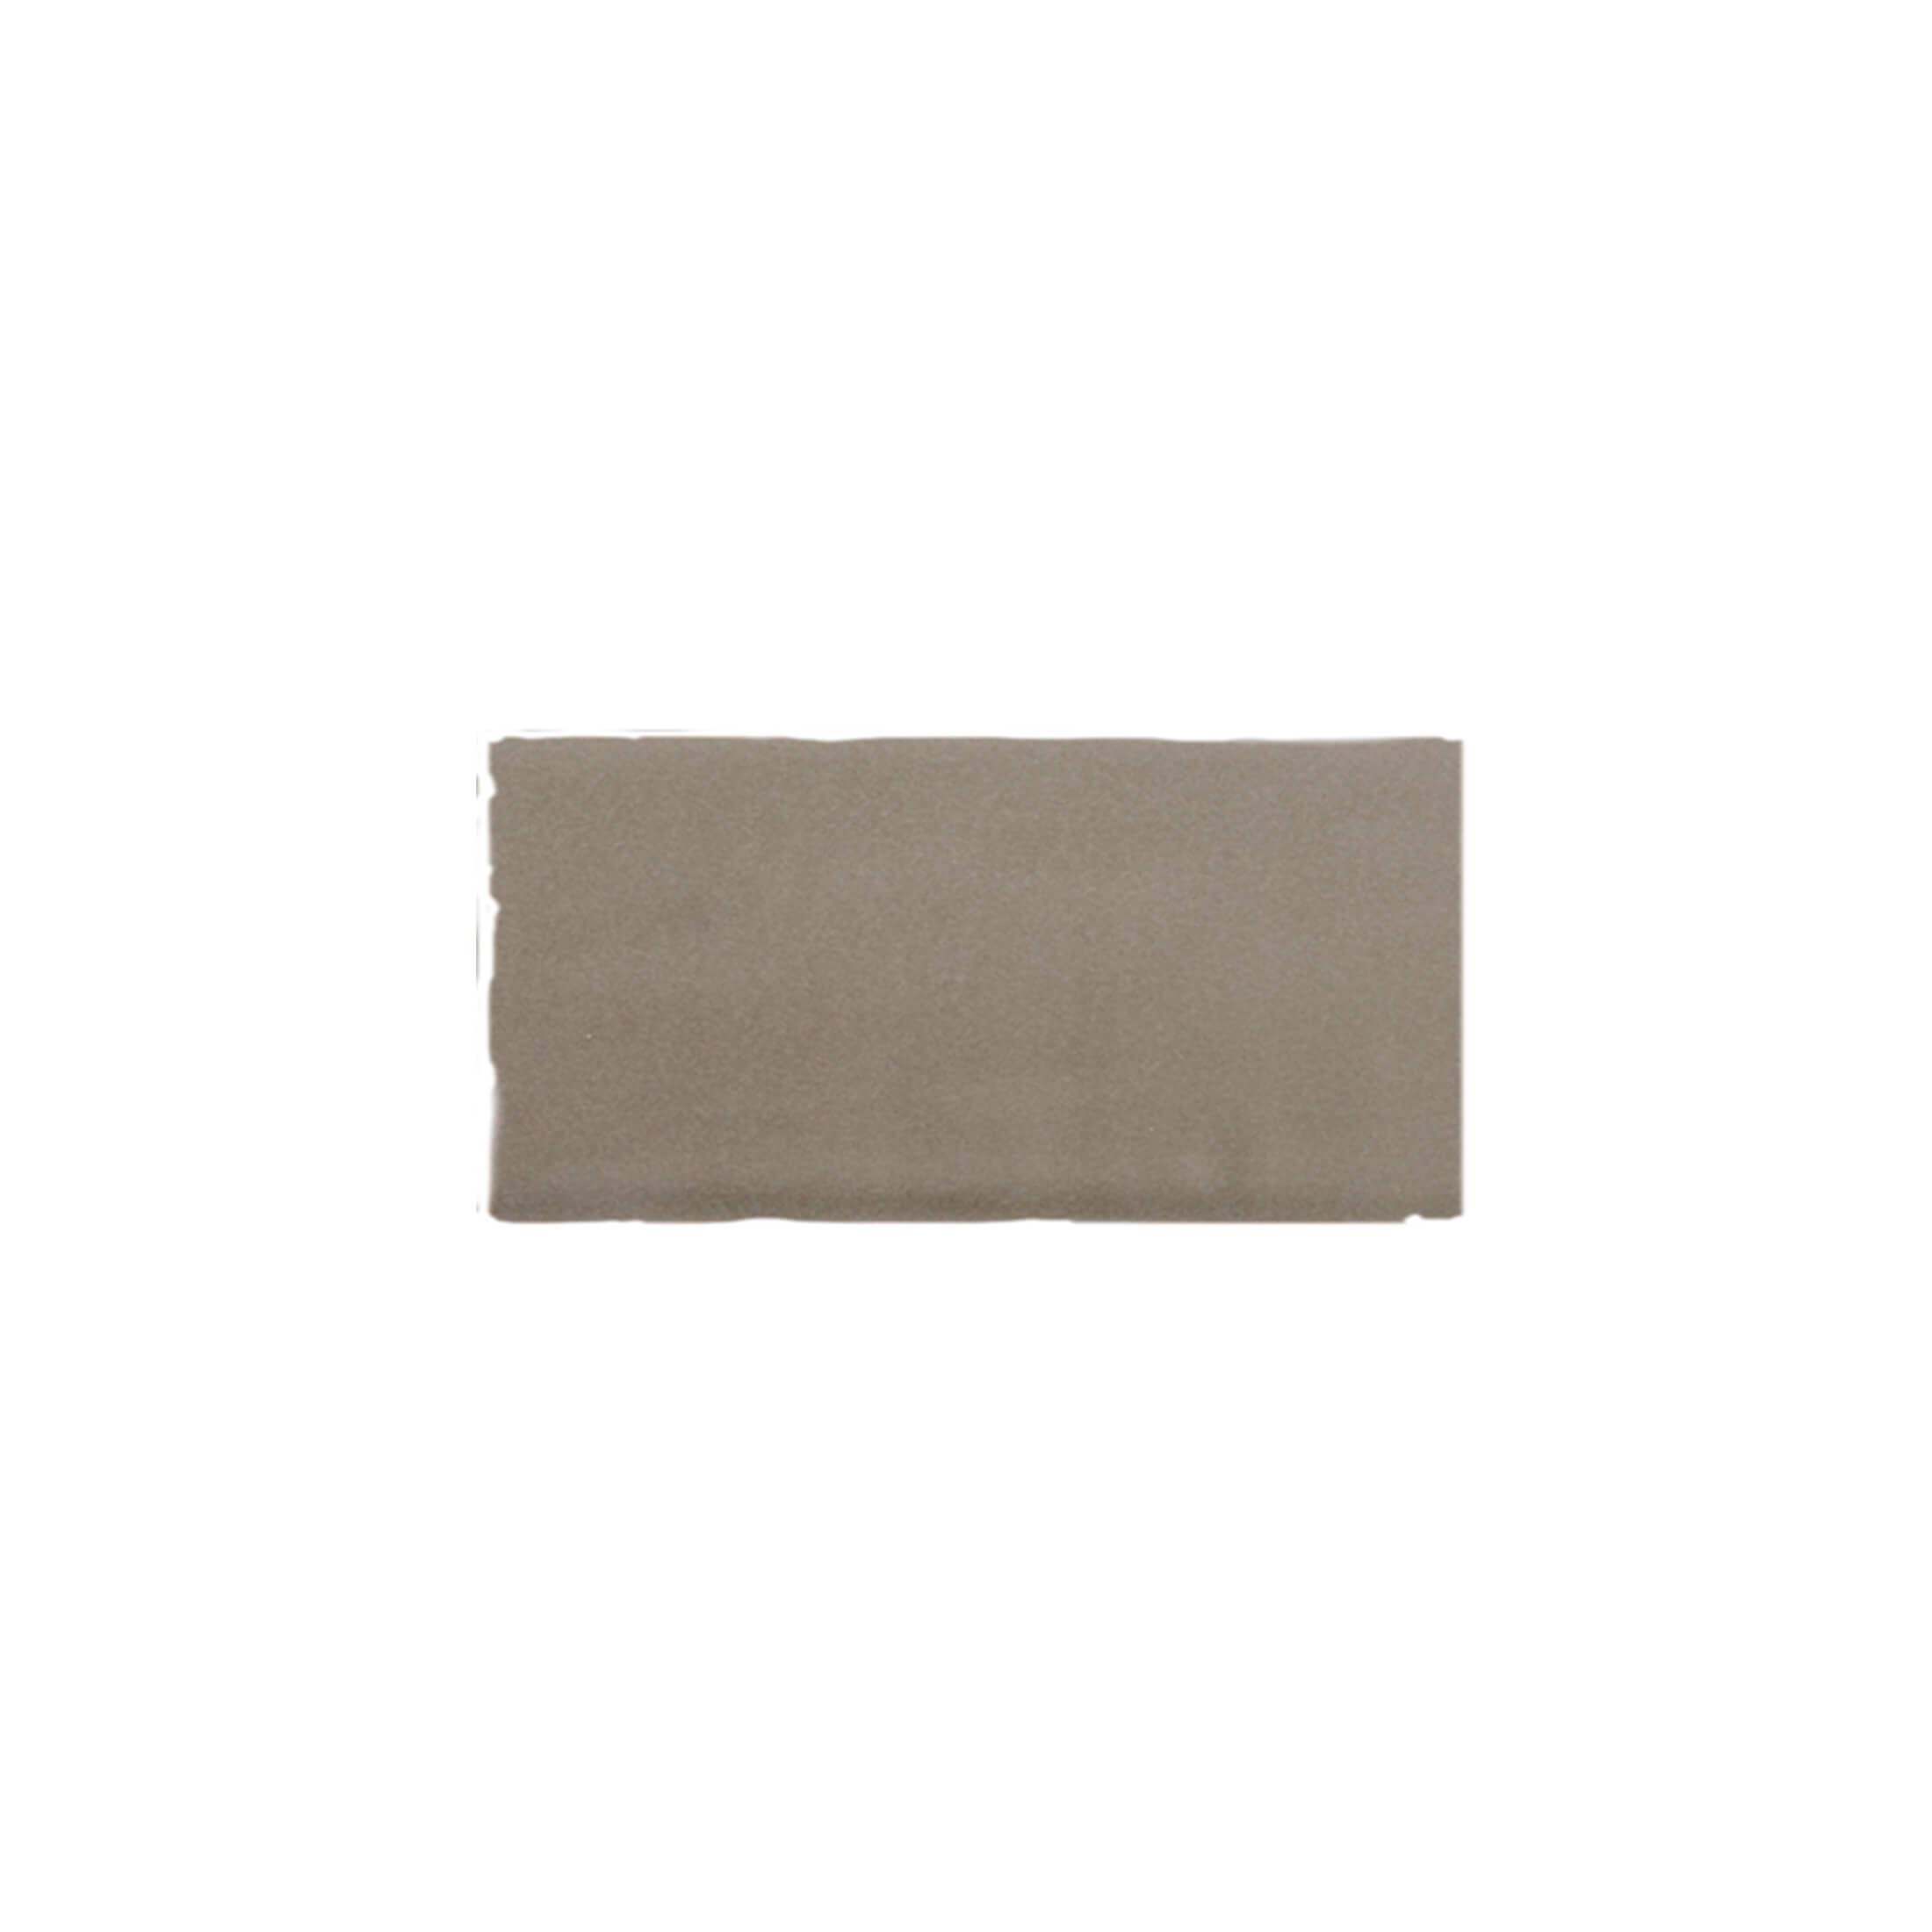 ADNT1007 - LISO  - 7.5 cm X 15 cm